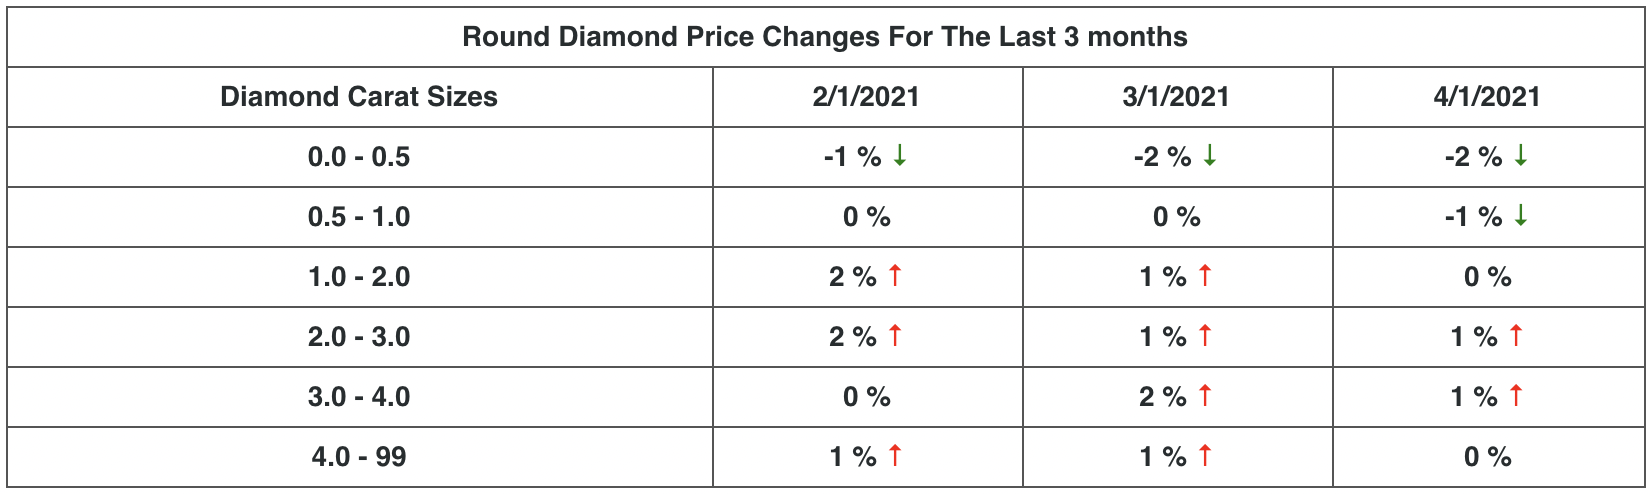 Round Diamond Price Changes - April 2021.